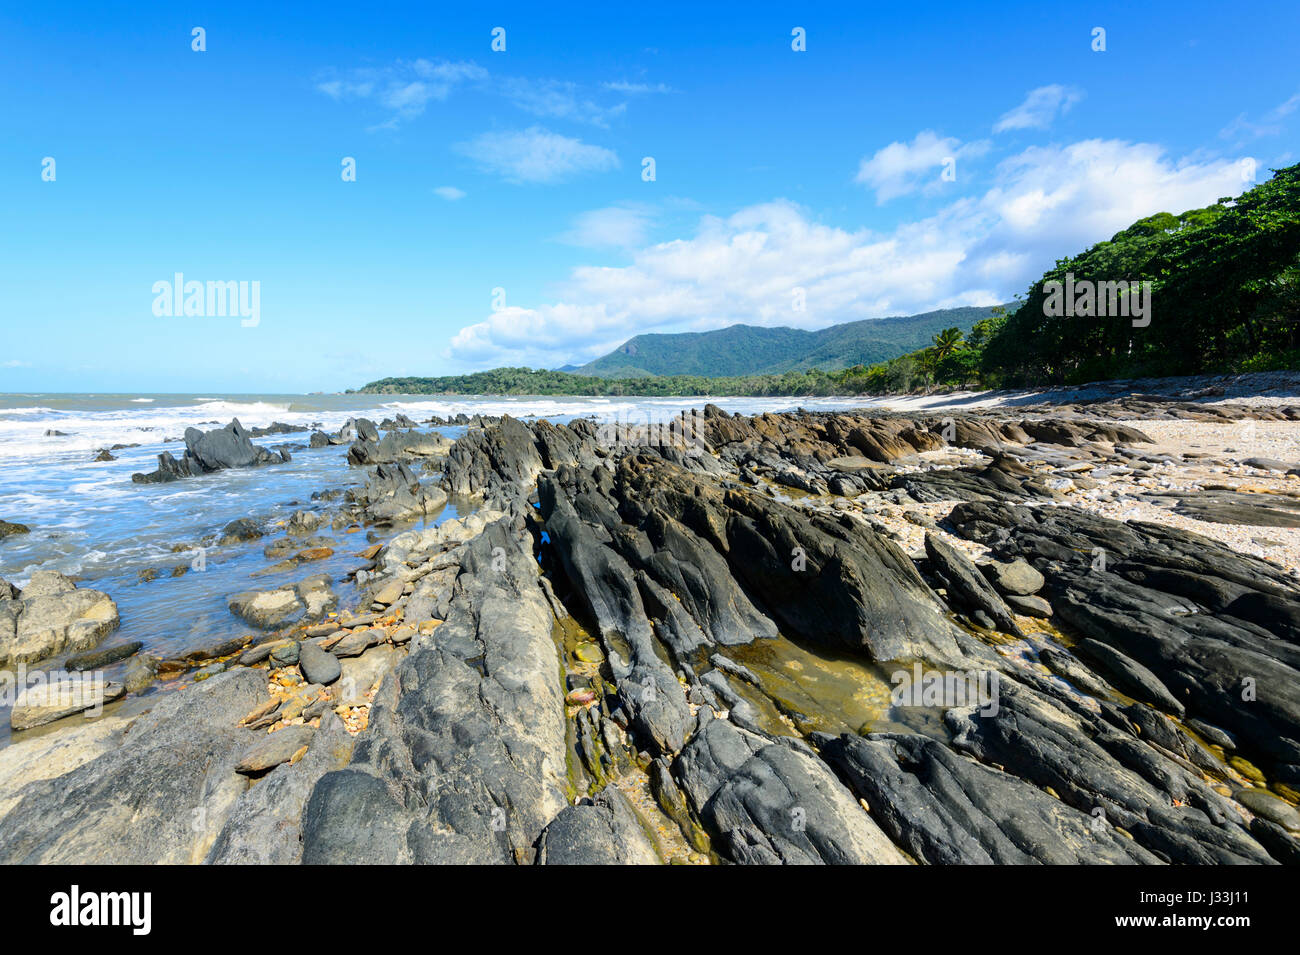 Pintoresca costa rocosa entre Cairns y Port Douglas, Far North Queensland, FNQ, Queensland, Australia Imagen De Stock